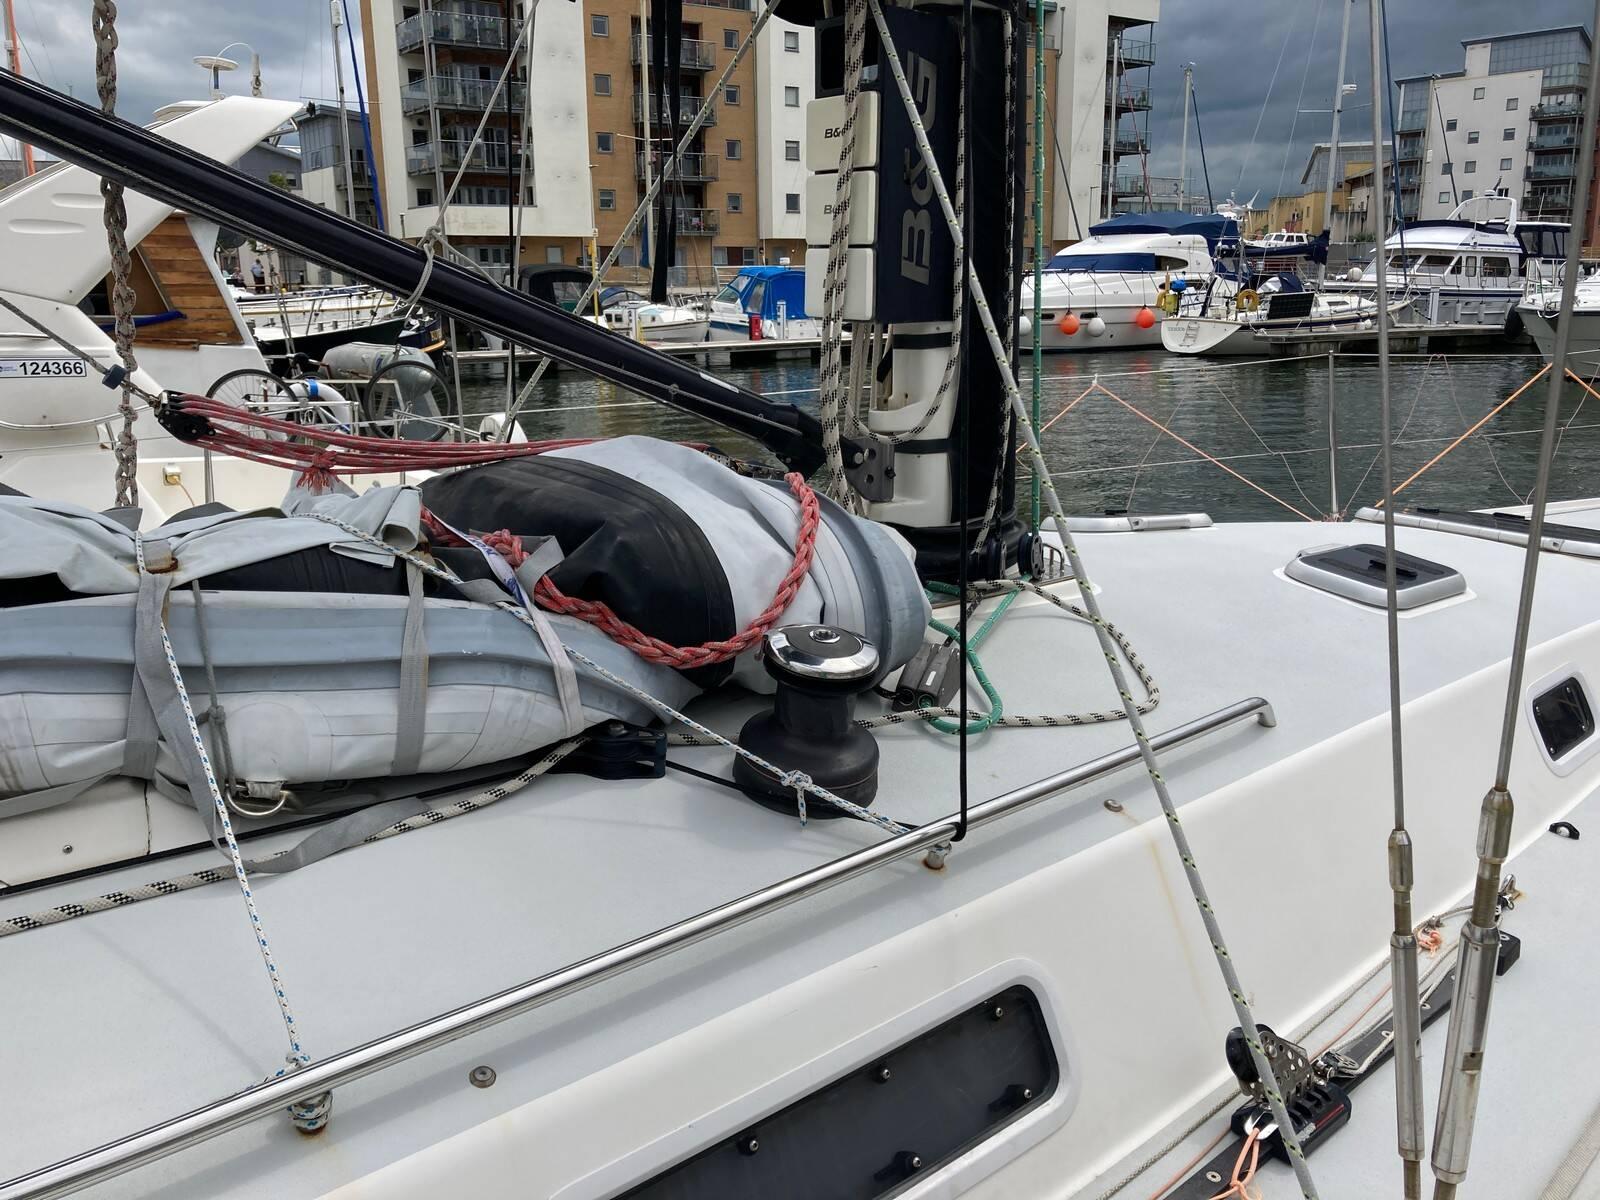 J/133 mast winch